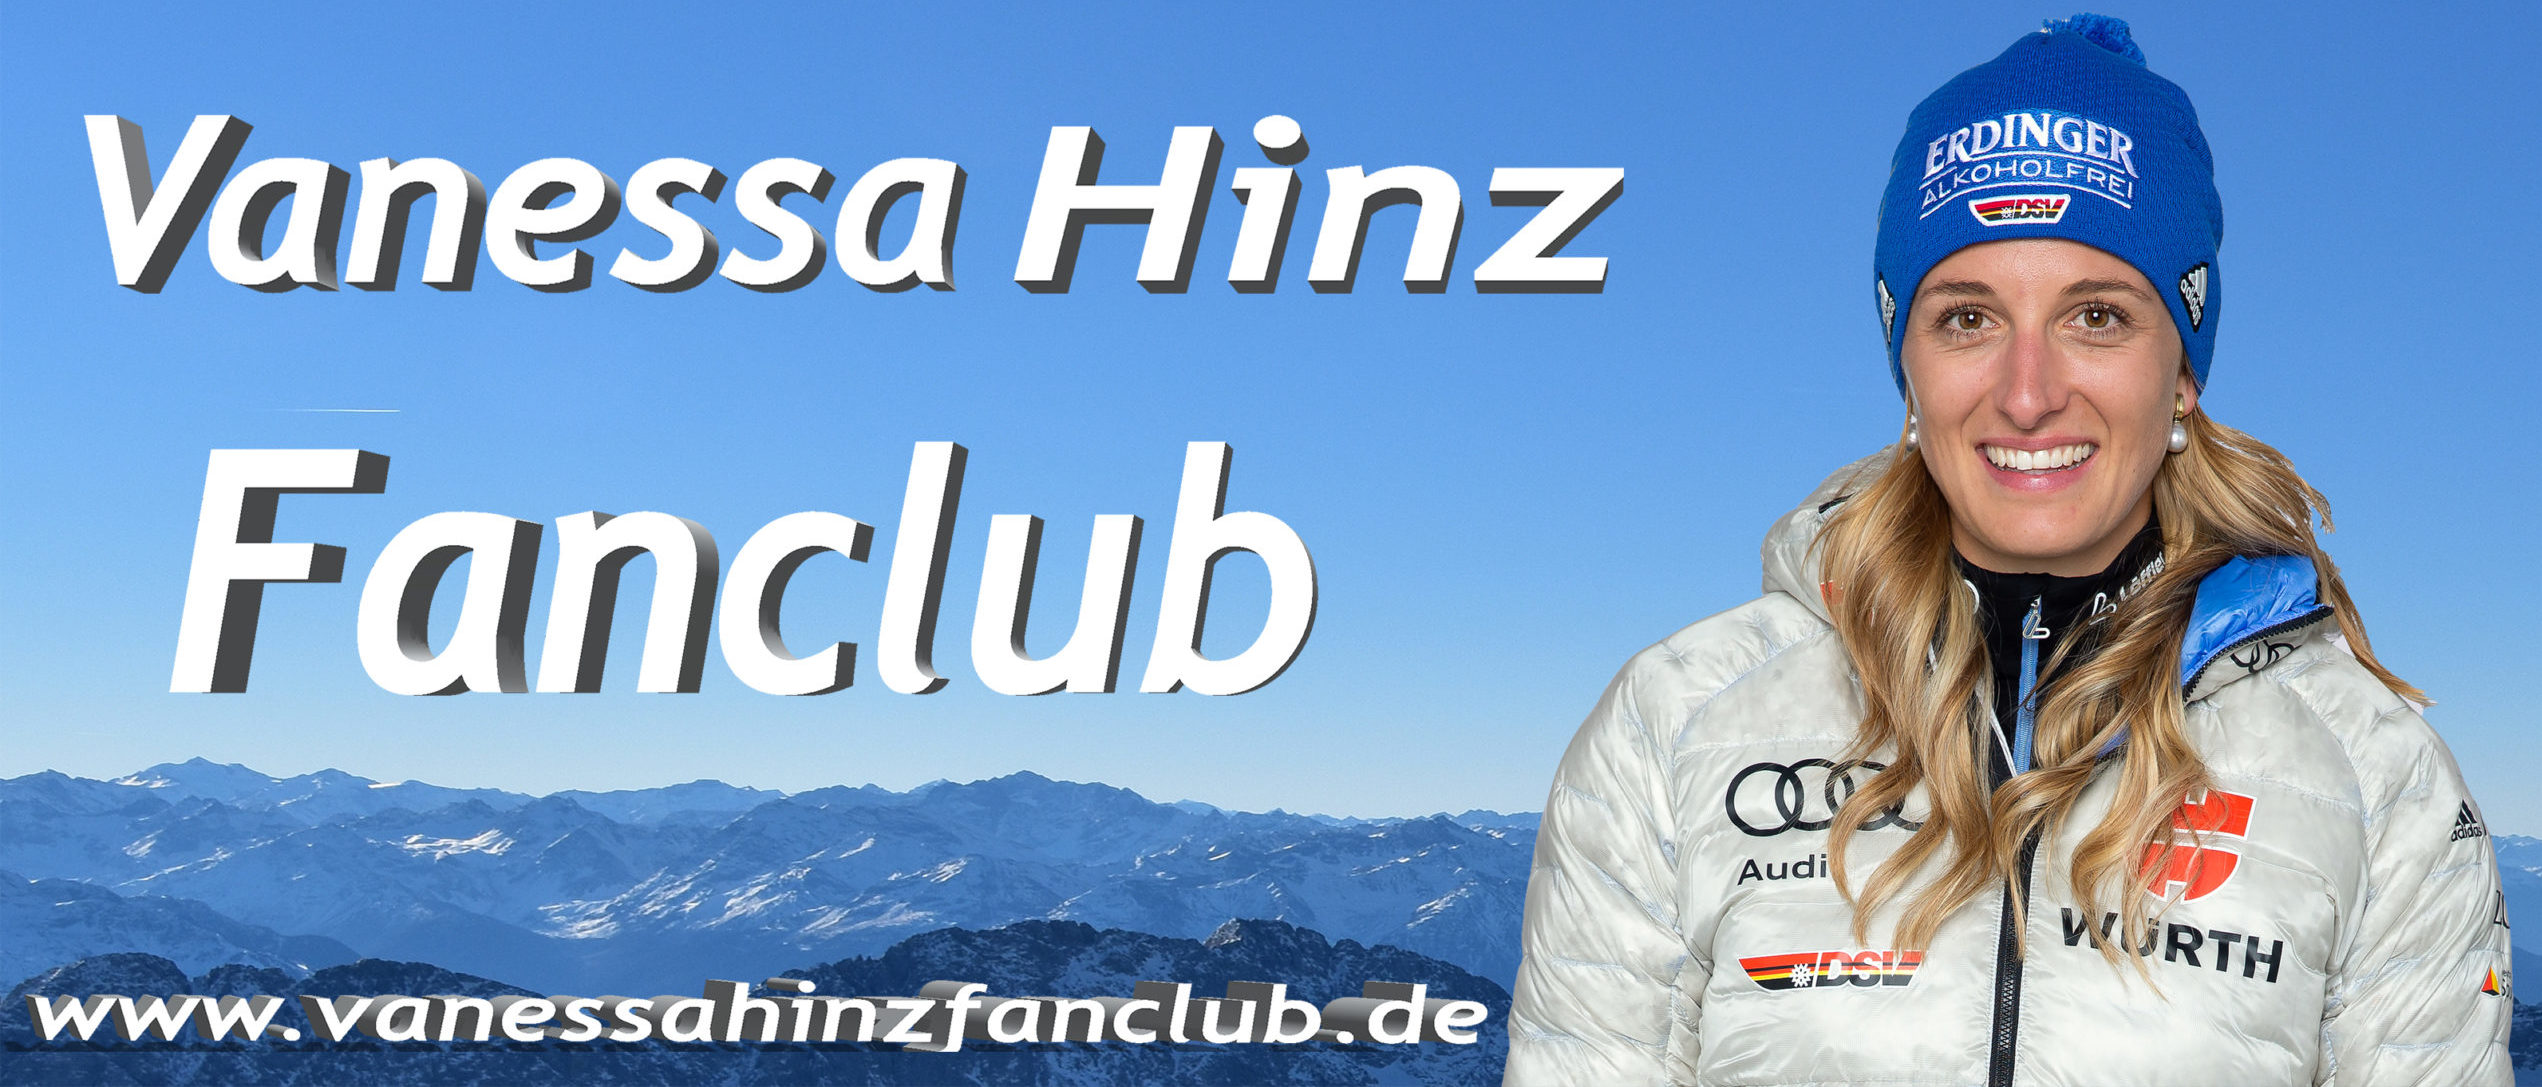 Vanessa Hinz Fanclub #VHFC